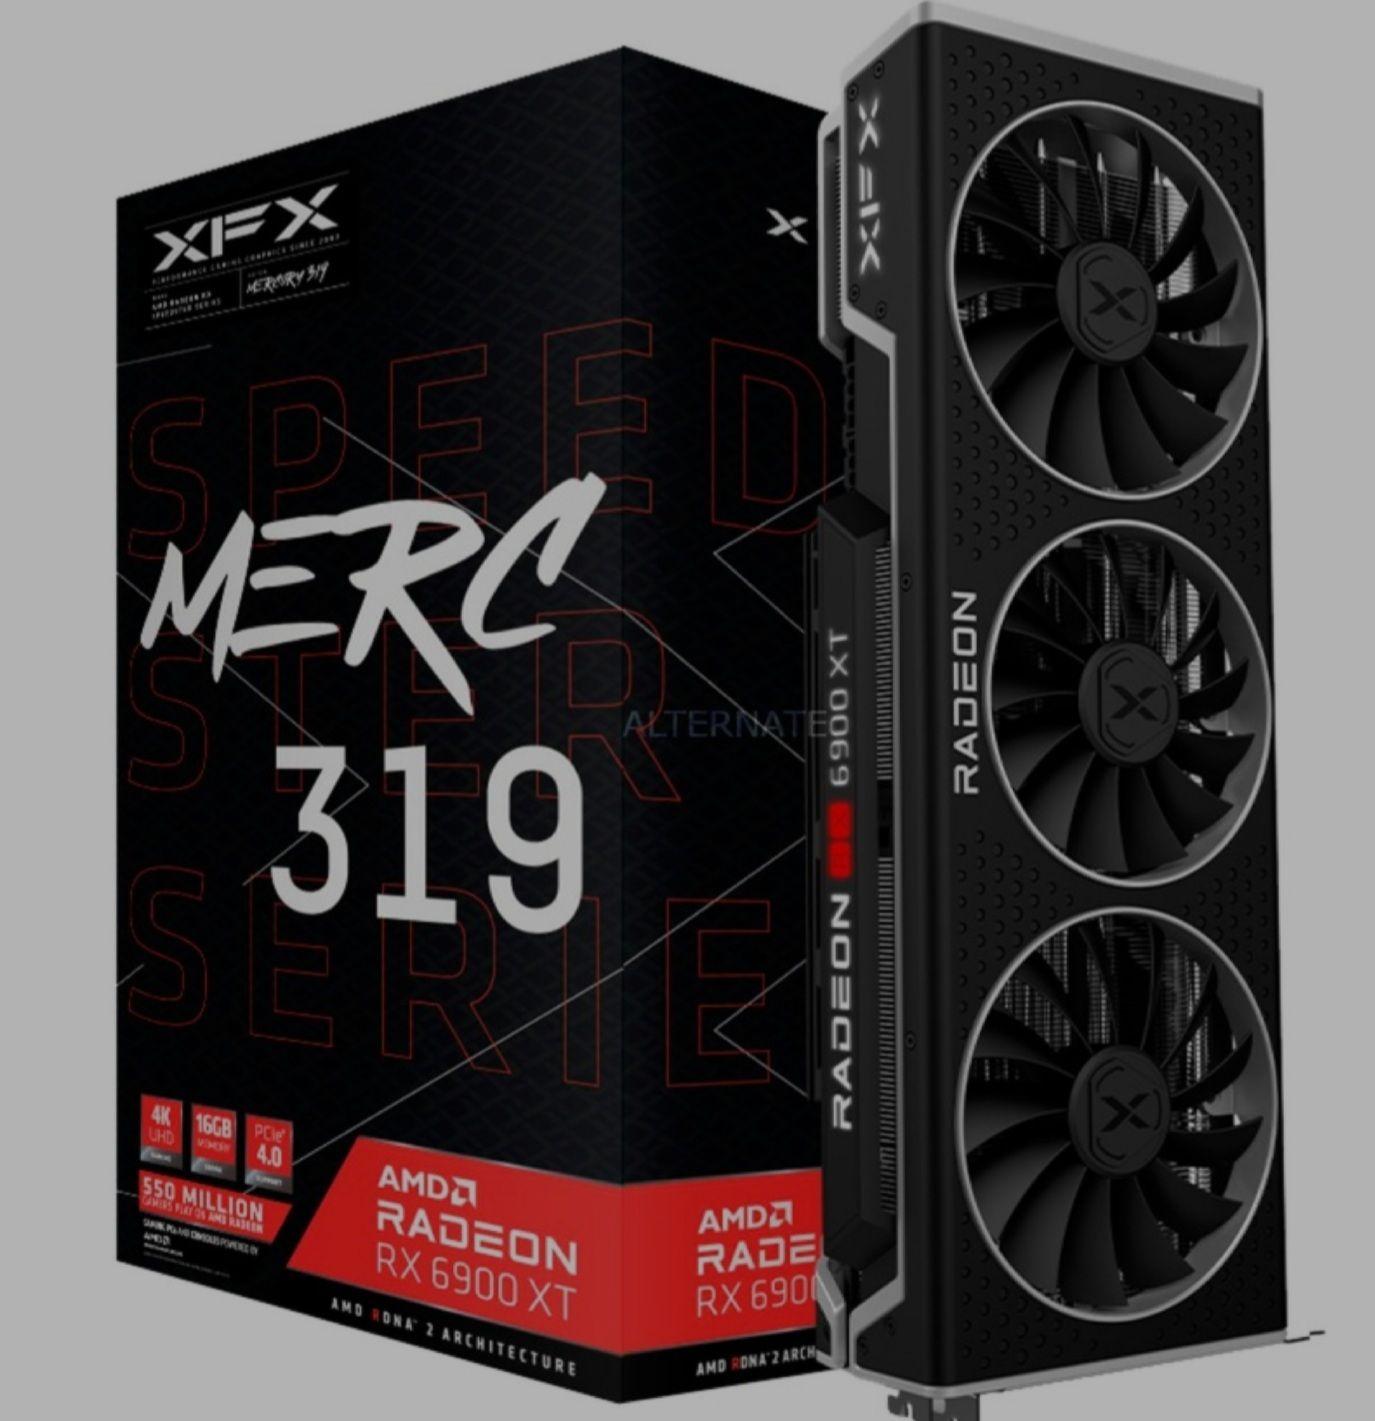 1355.99€ Alternate, XFXRadeon RX 6900 XT Merc 319 Black 16GB, Grafikkarte